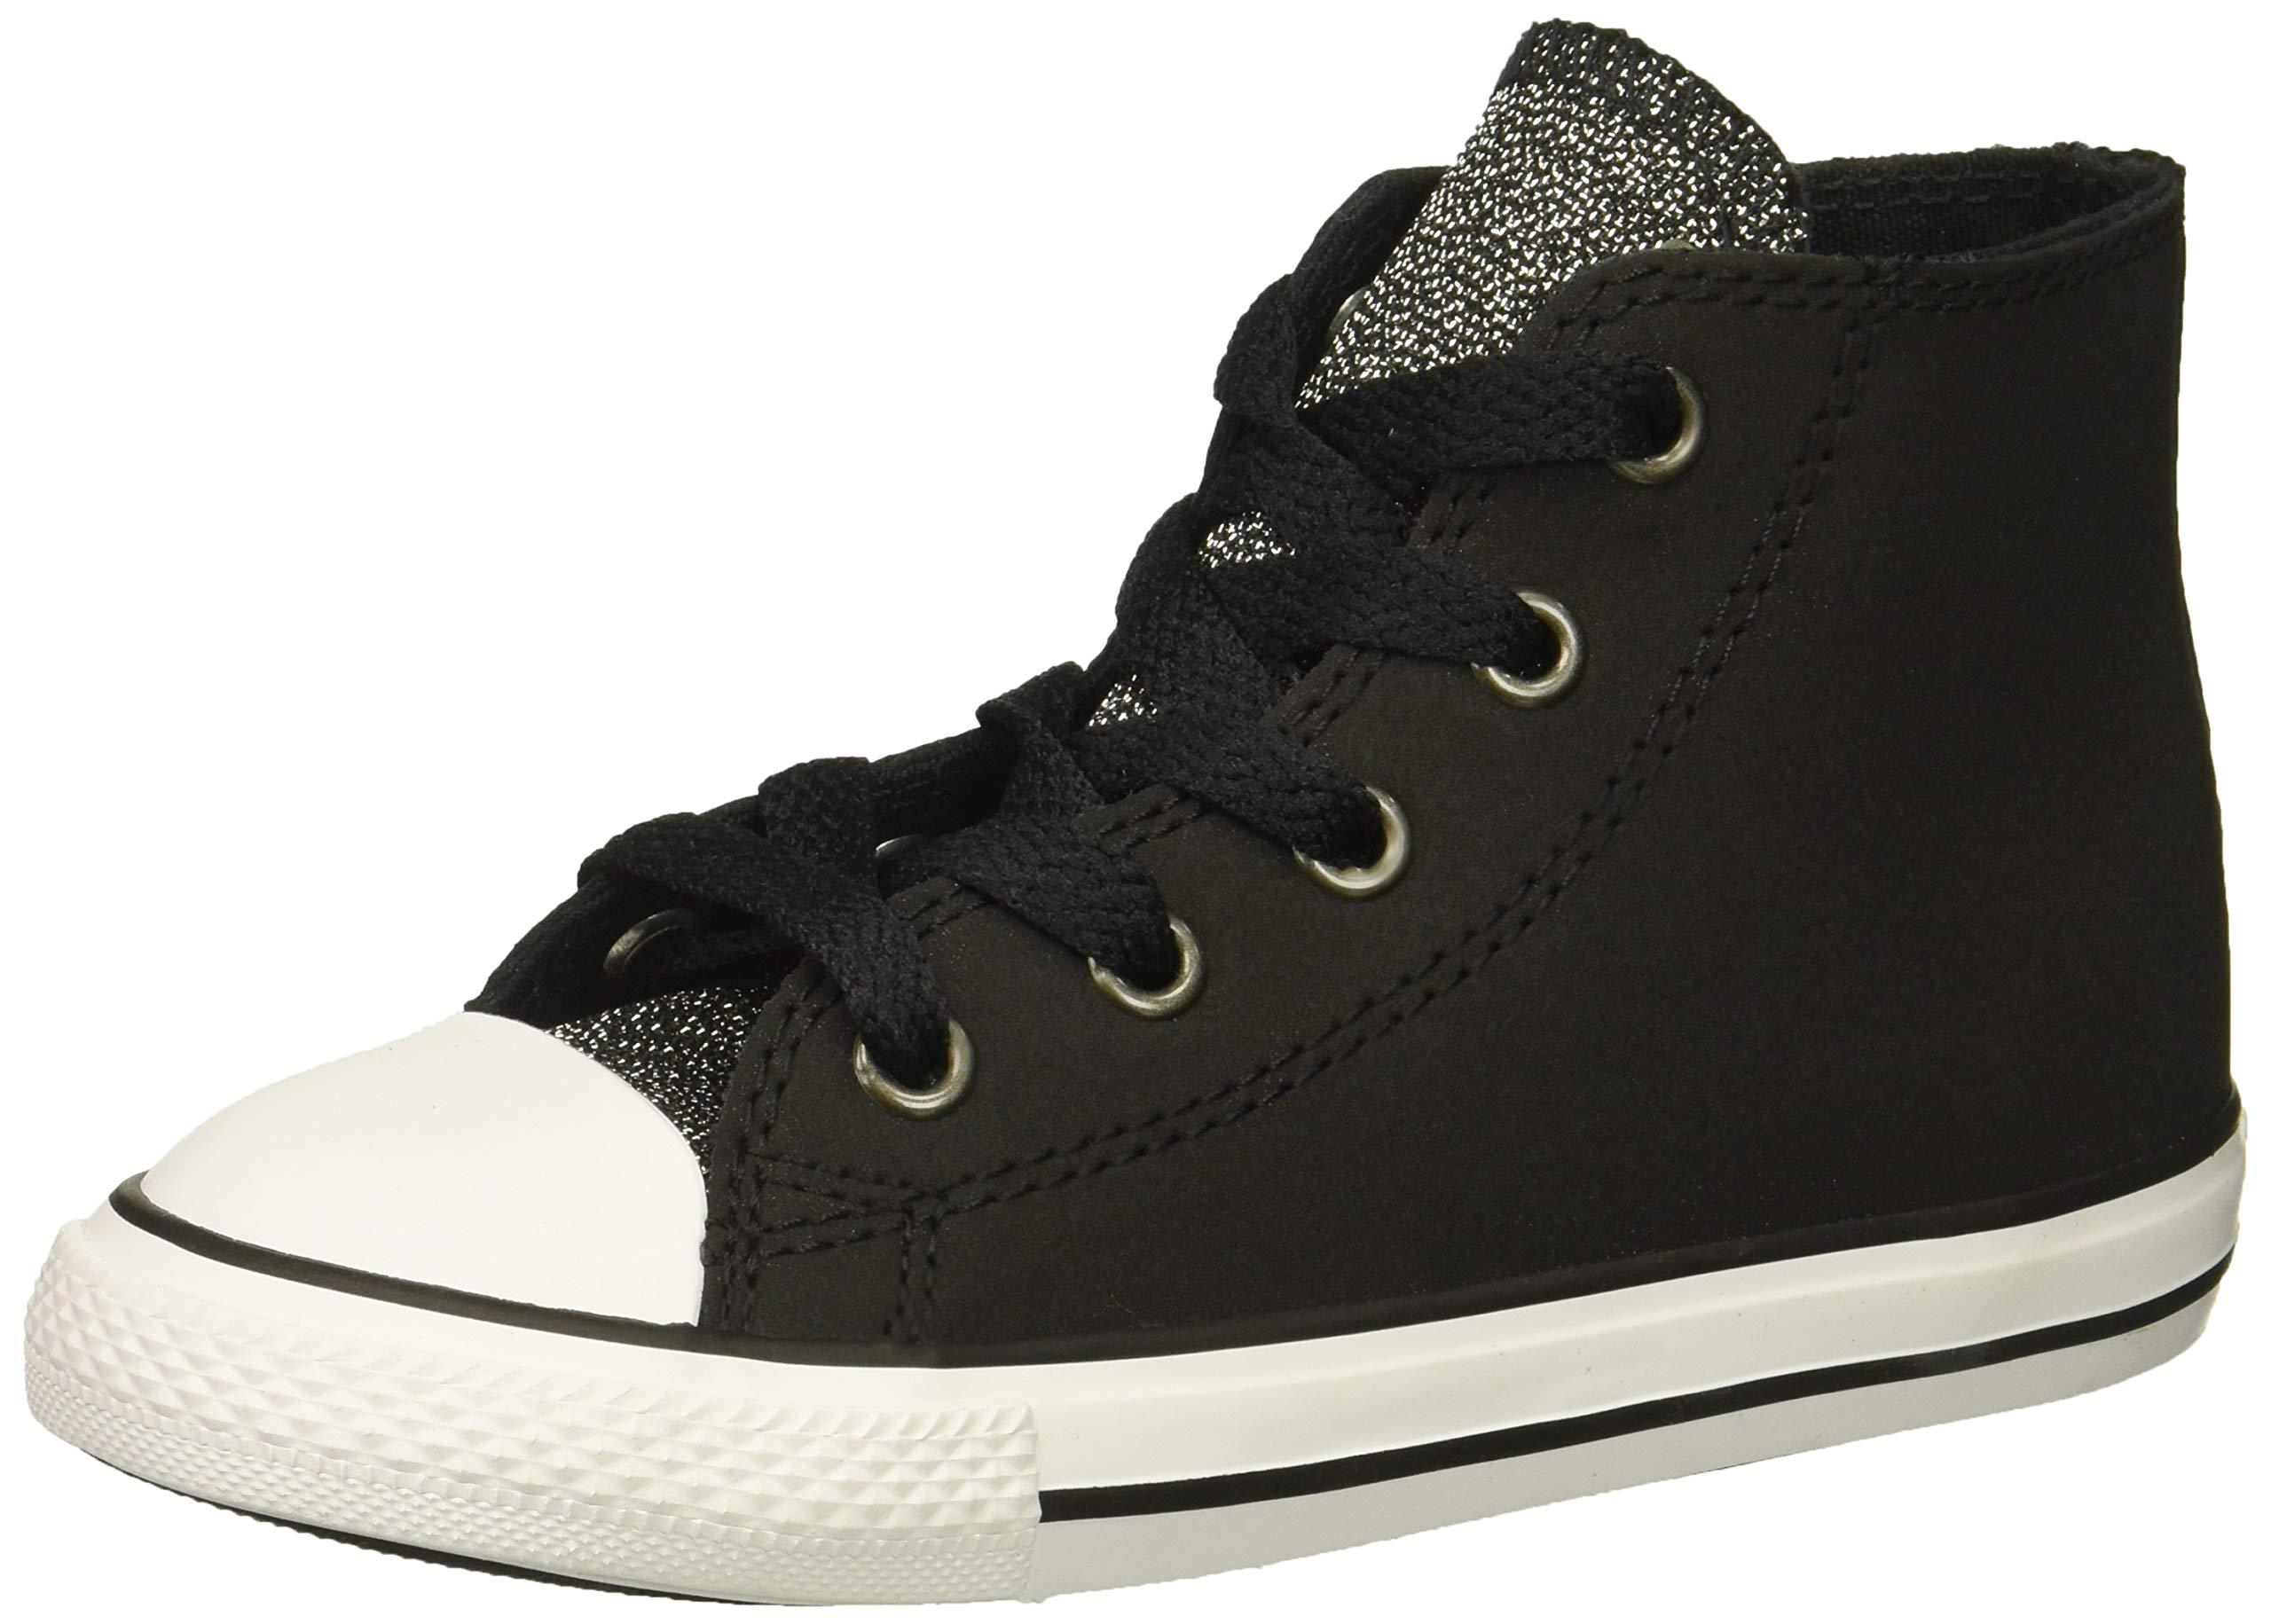 Converse Girls' Chuck Taylor All Star Glitter High Top Sneaker, BlackWhite, 7 M US Toddler